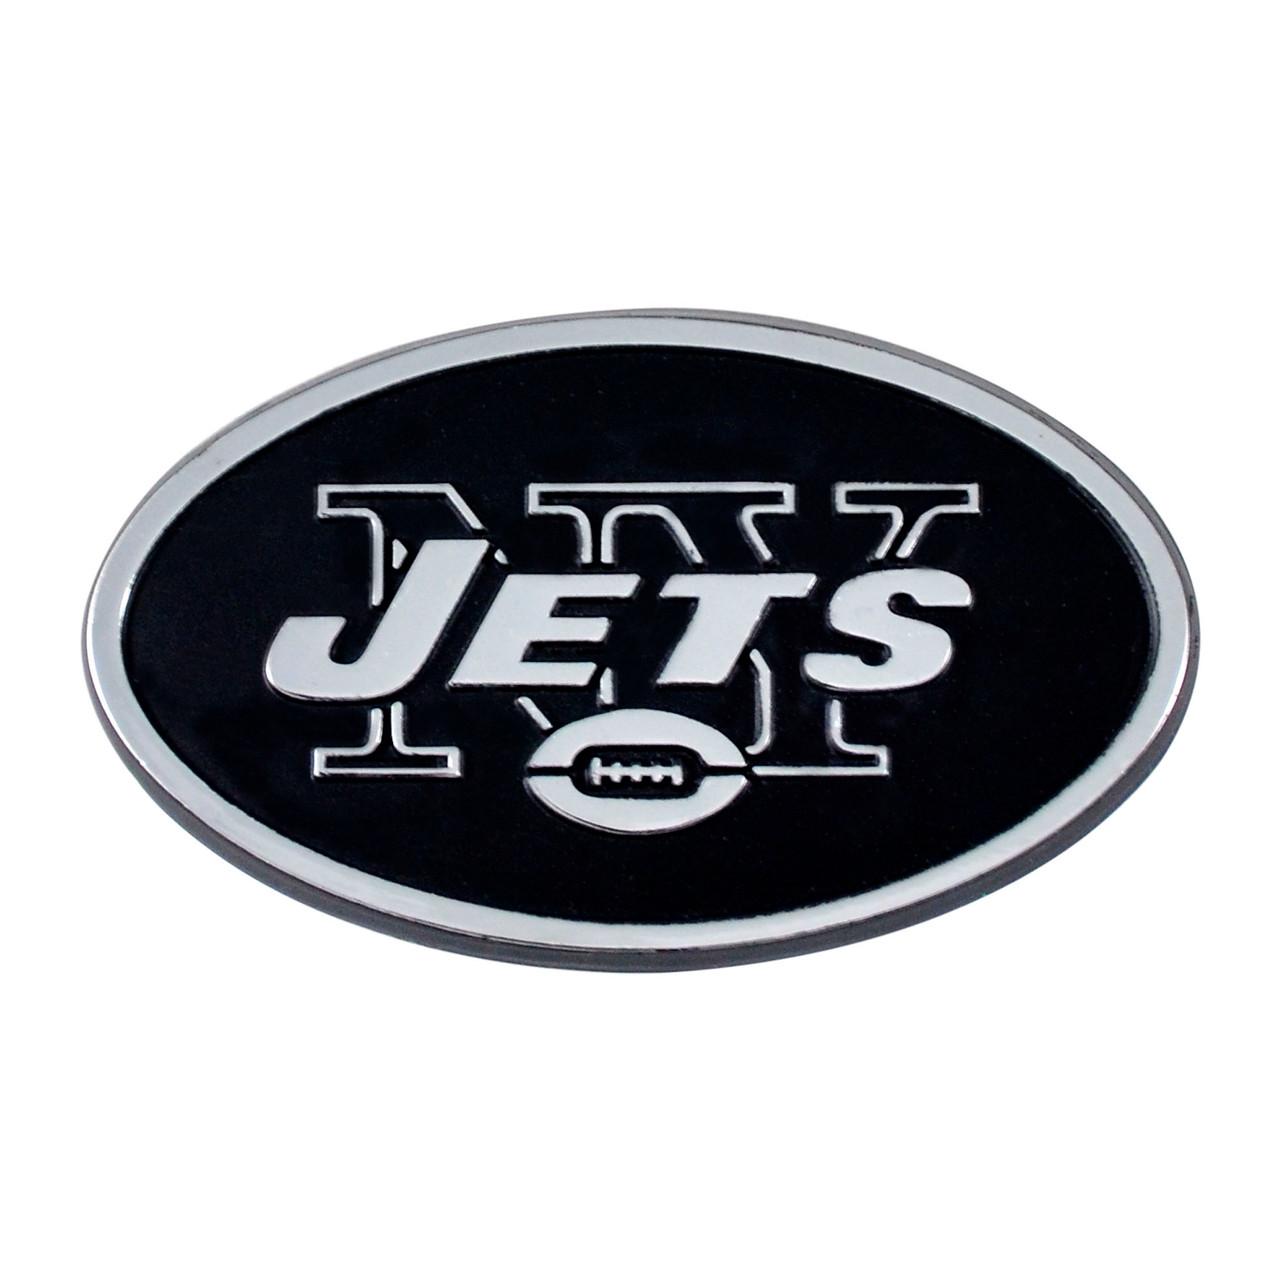 New York Jets Auto Emblem Premium Metal Chrome